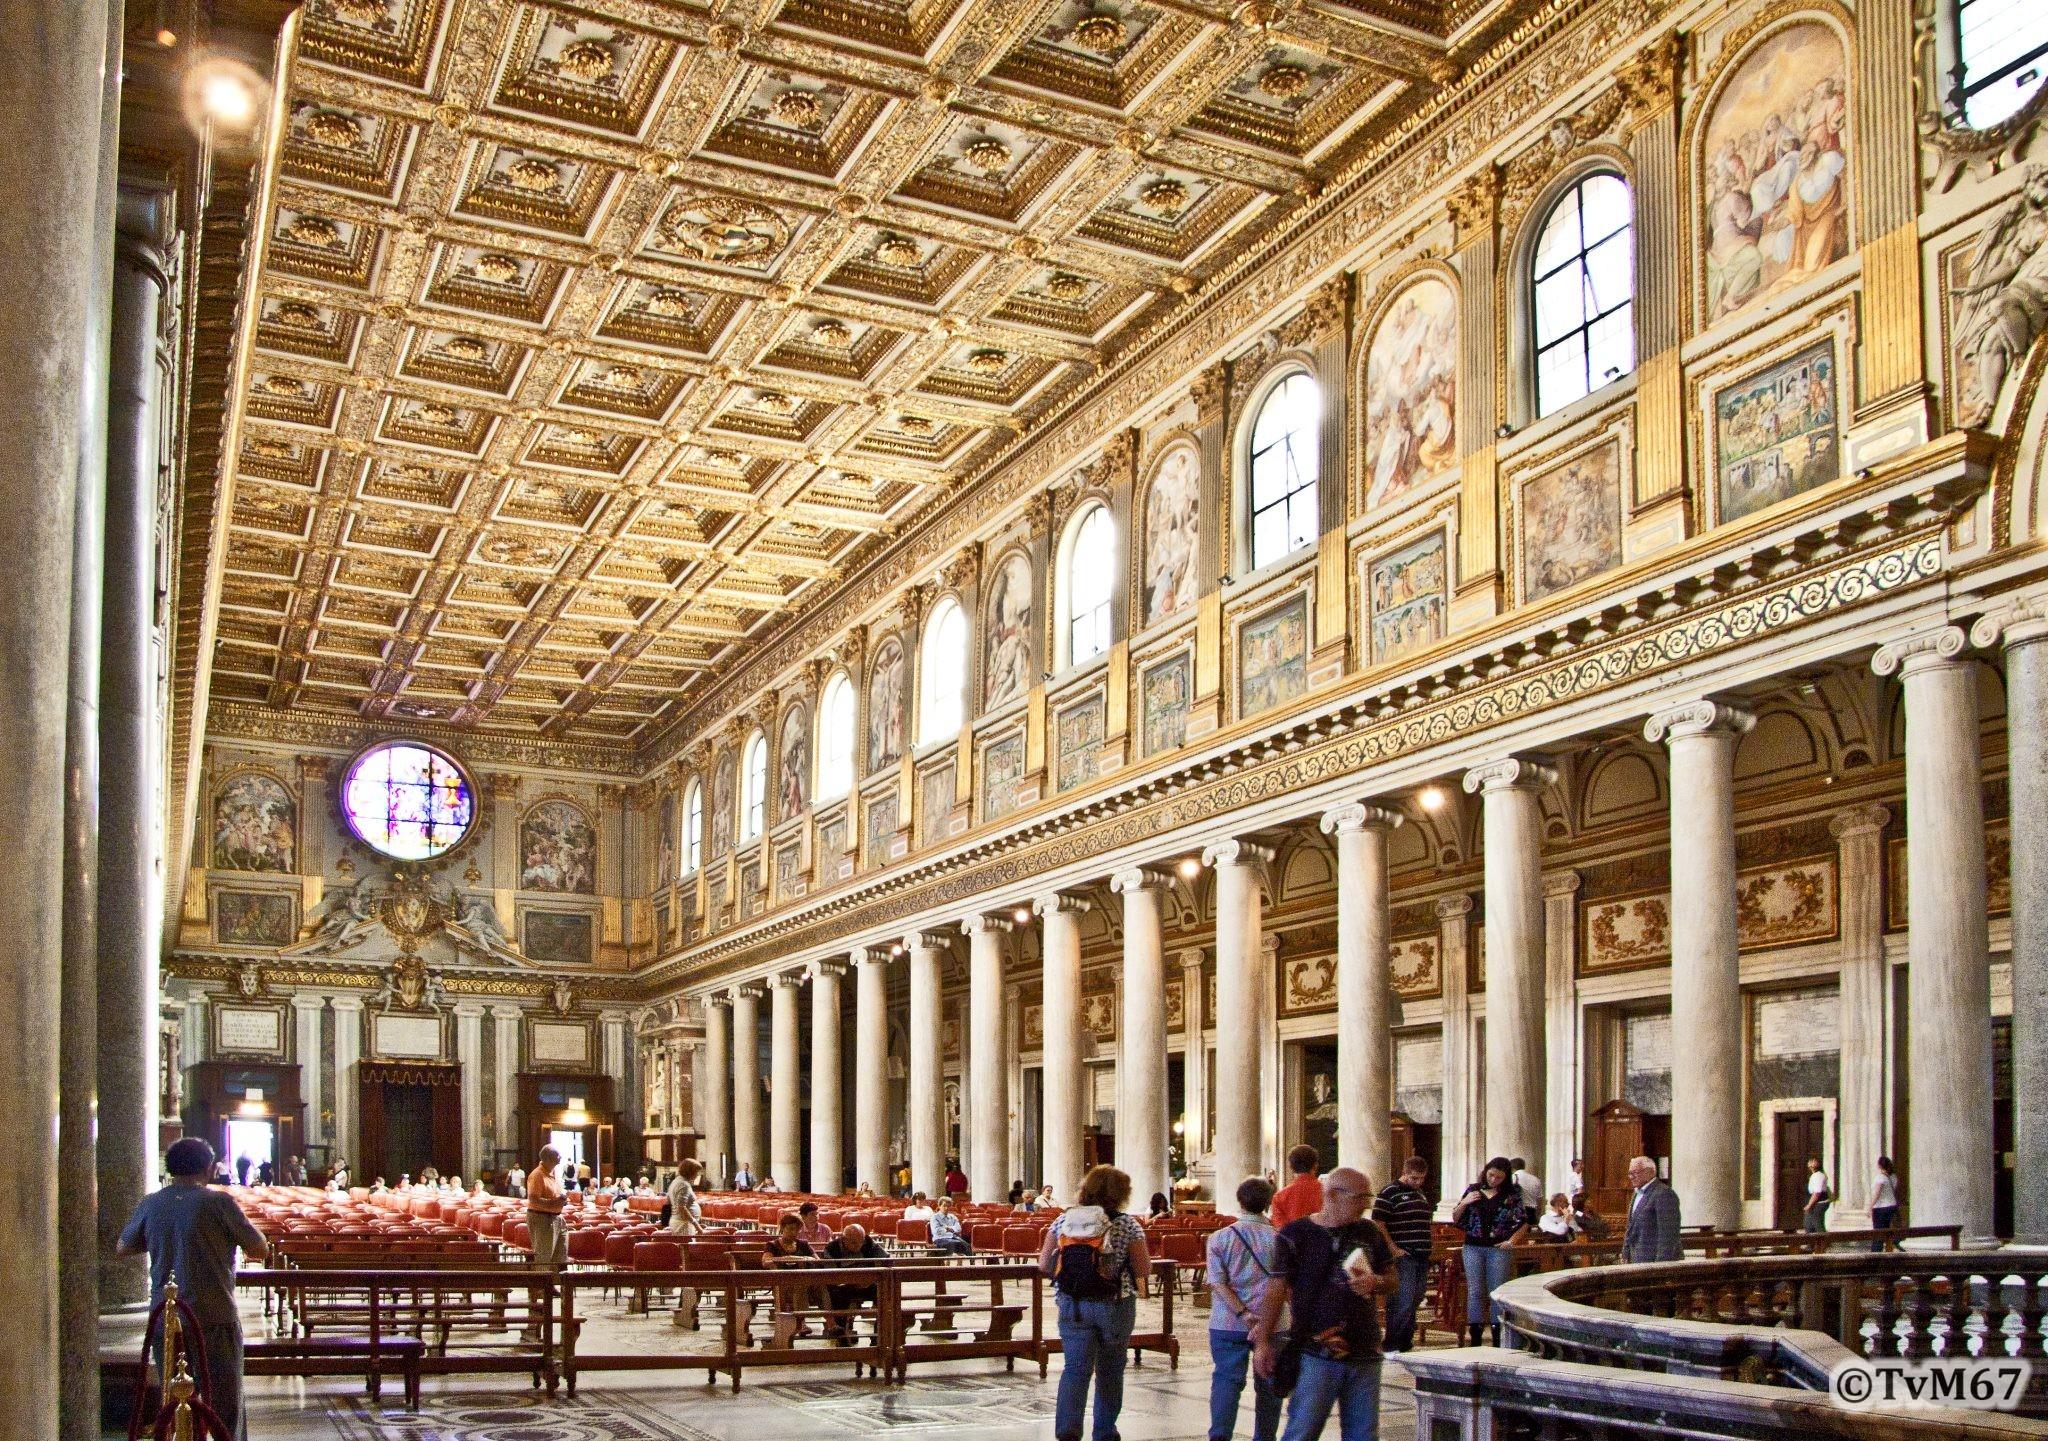 Roma, Basilica di Santa Maria Maggiore, Middenschip, van voor naar achter, 2009